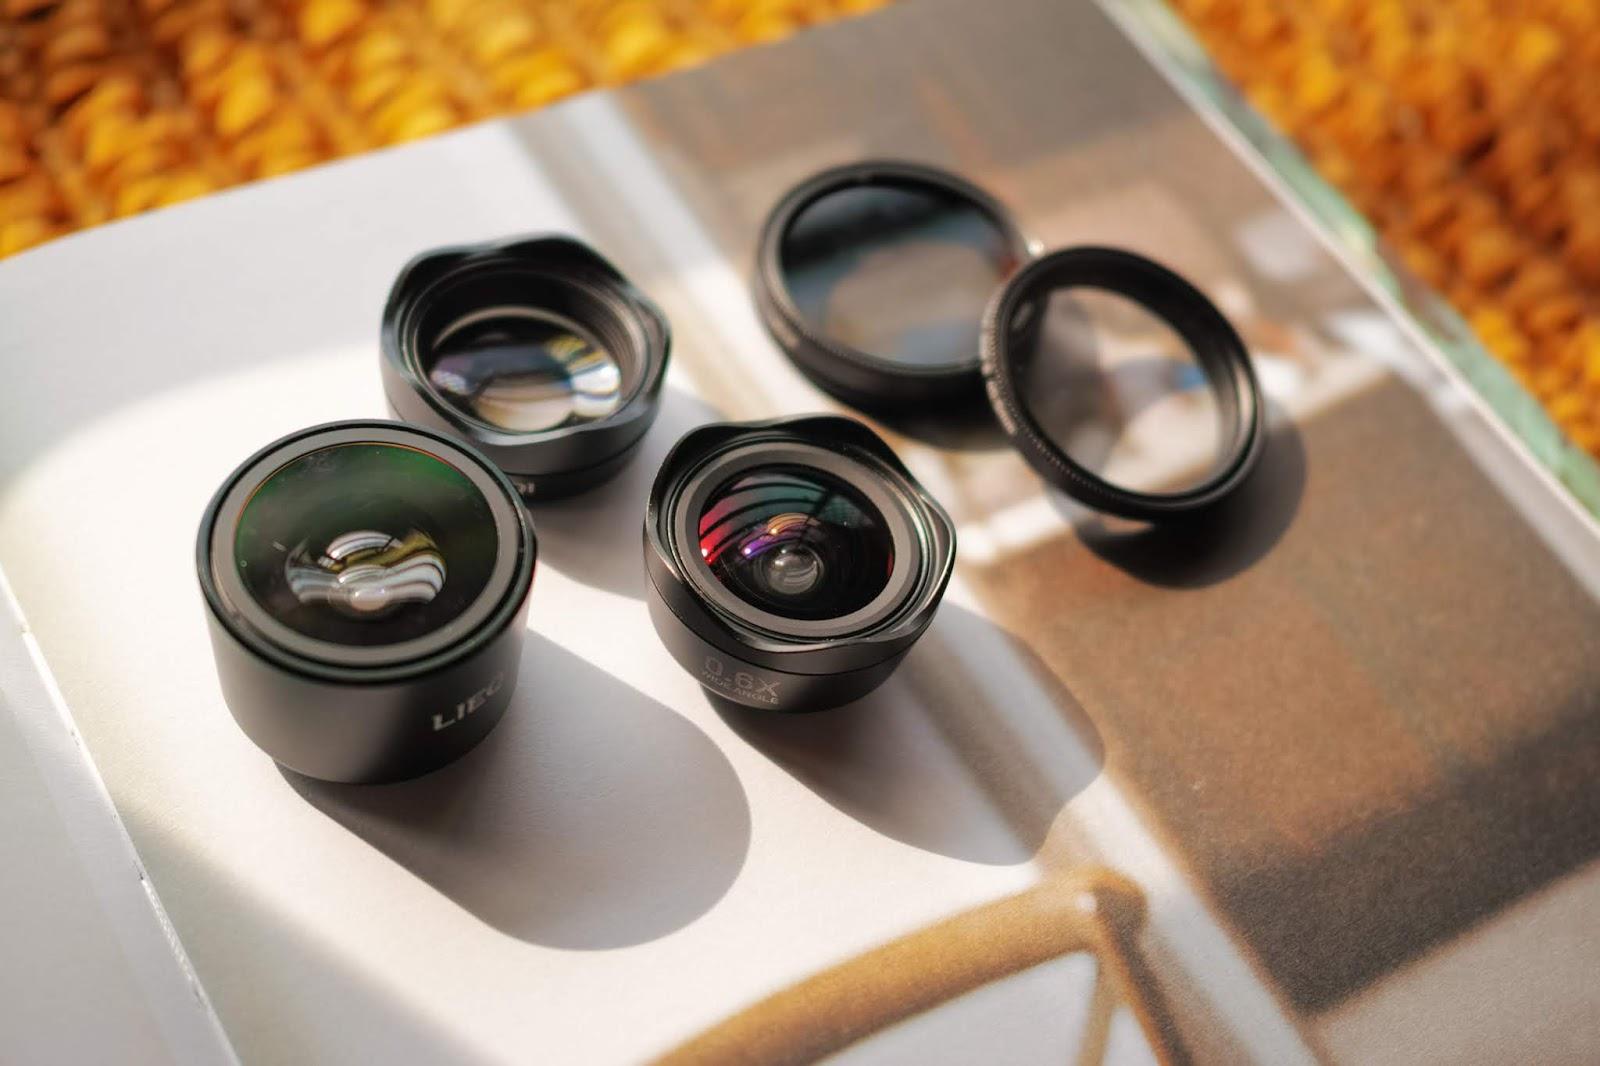 「LIEQI LQ PRO-285 / 頂級款」手機外接鏡頭推薦   iPhone XS MAX 高畫質拍攝 - mookio 阿默